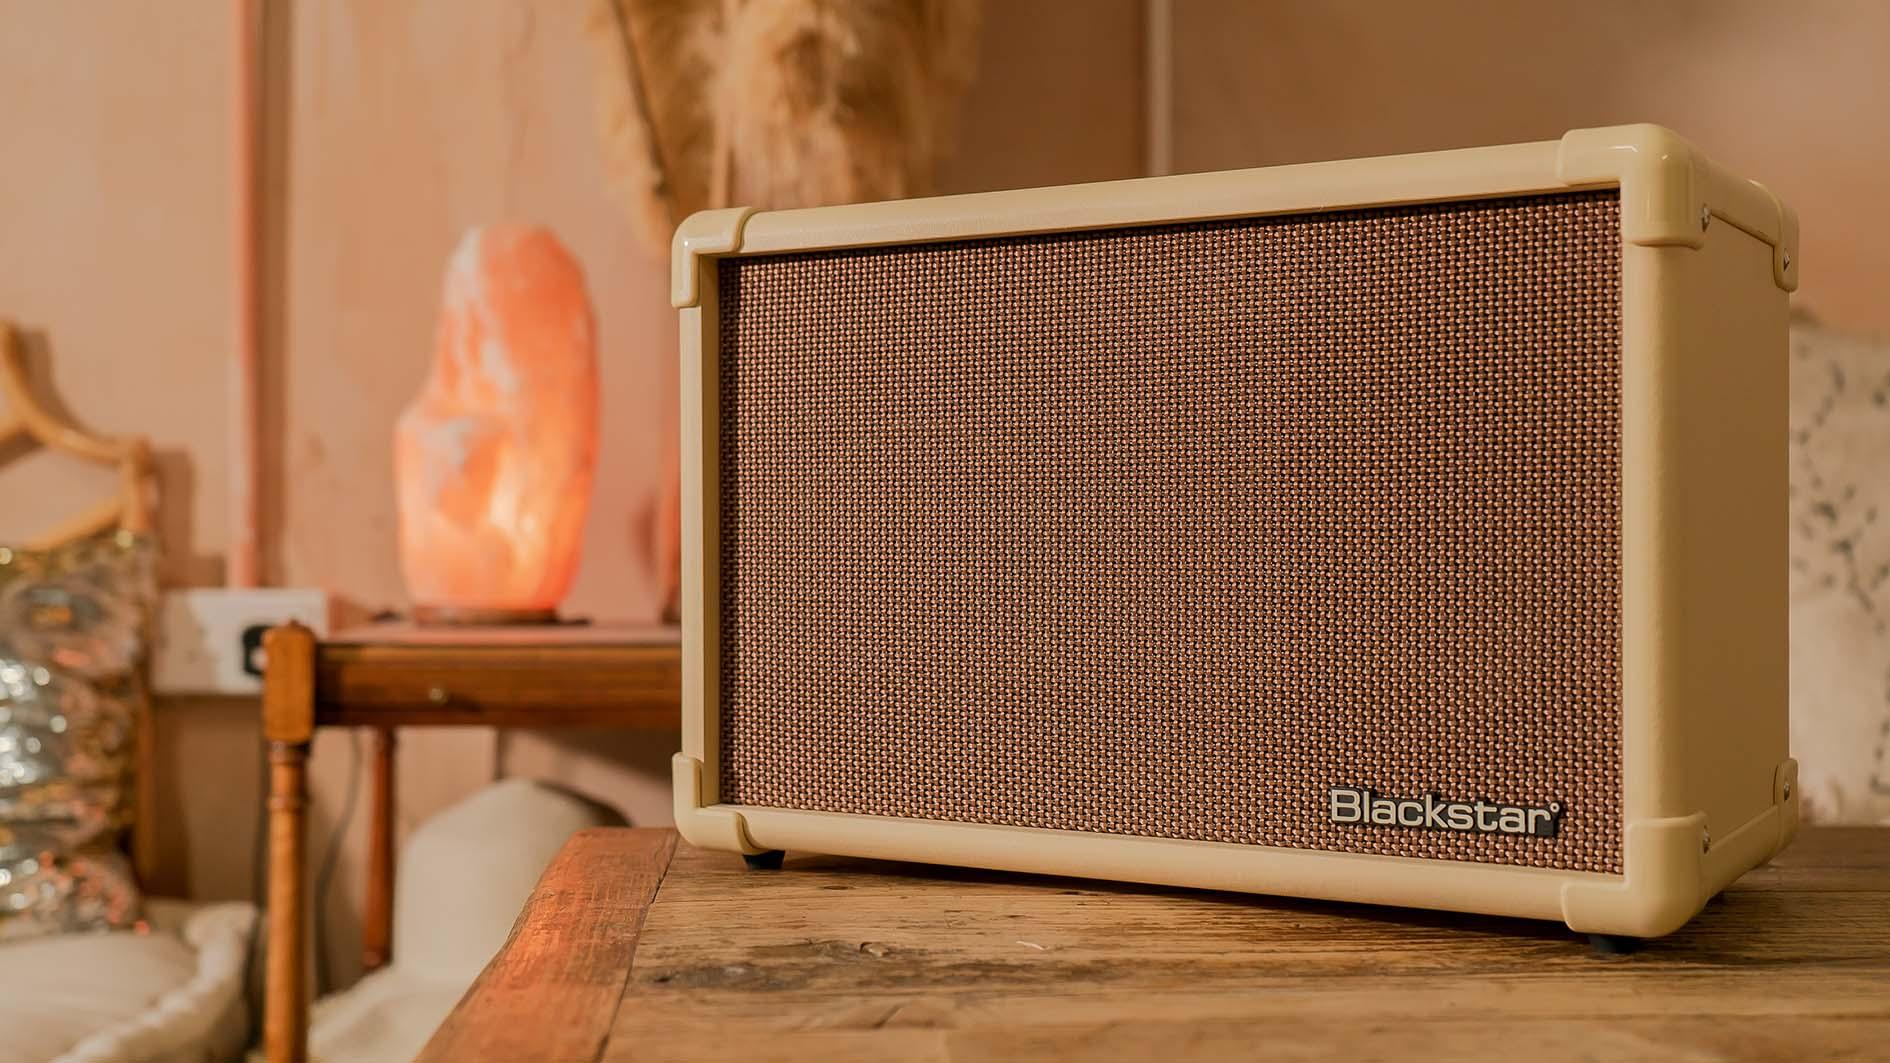 Blackstar unveils the mega-affordable, livestream-compatible ACOUSTIC:CORE 30